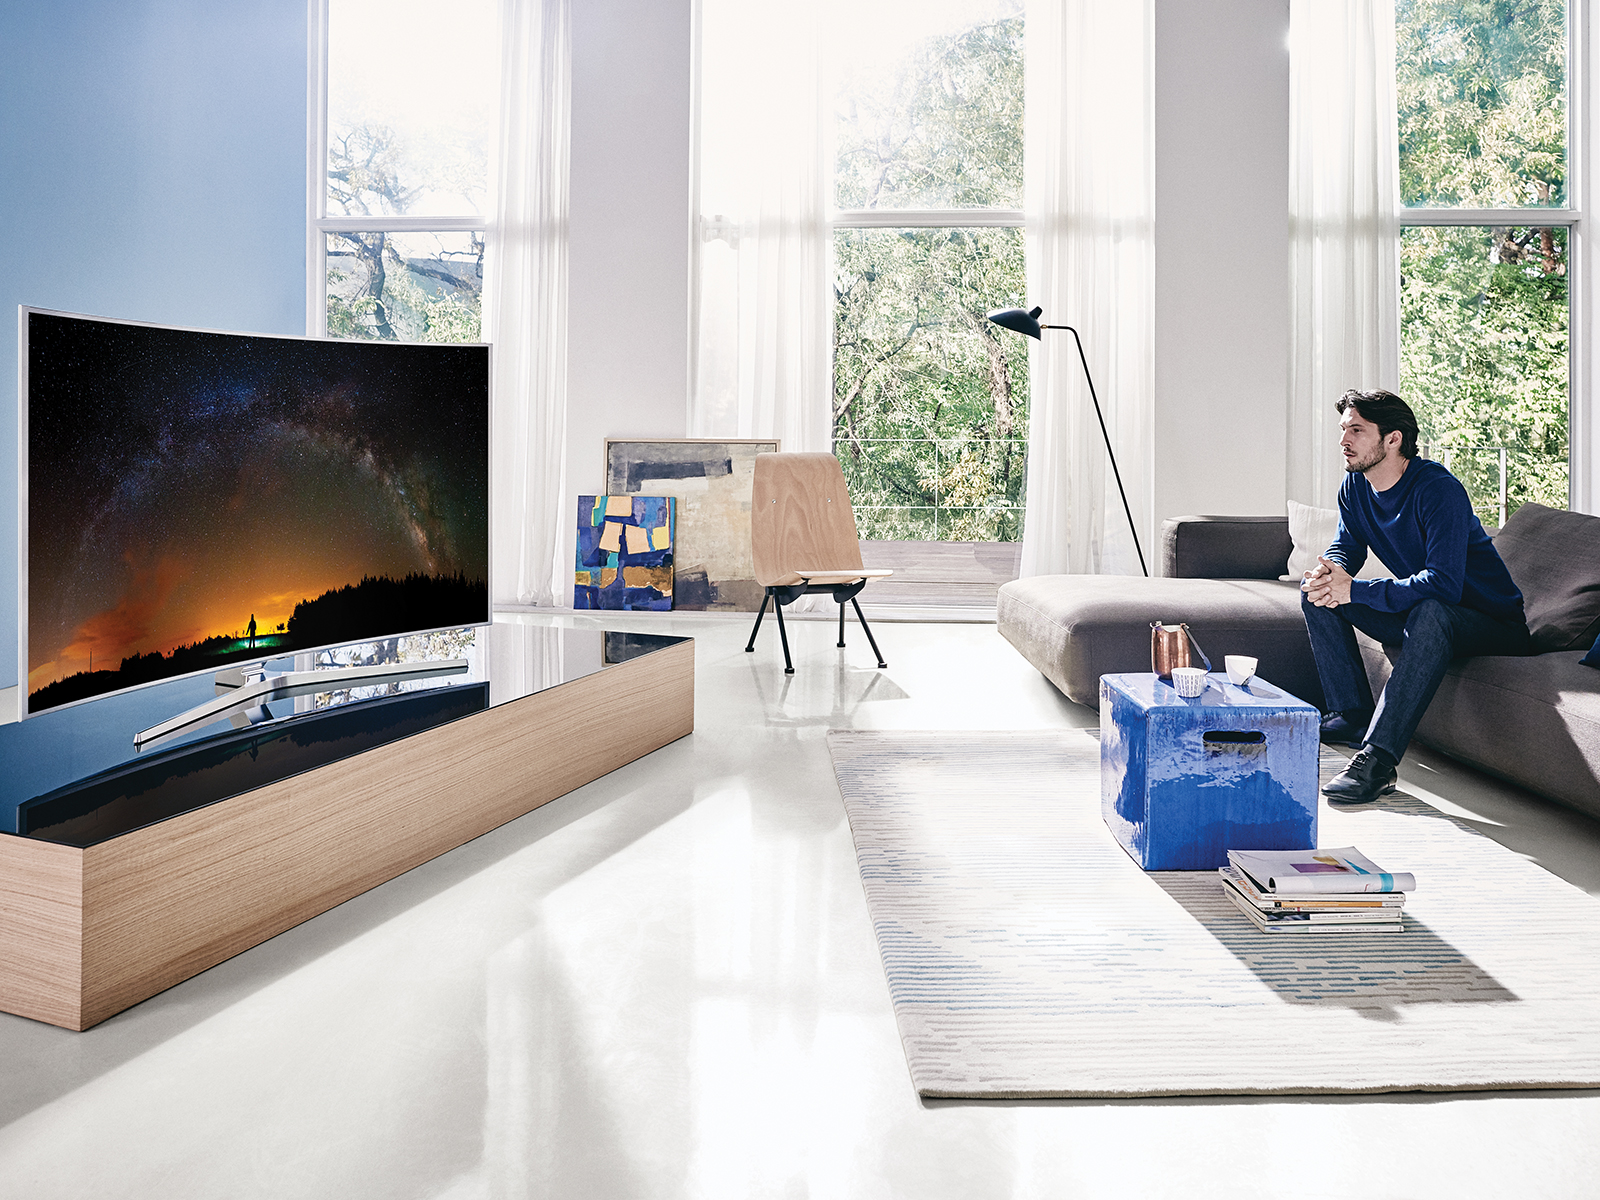 CES: bedien je slimme woning met de Samsung Smart Remote